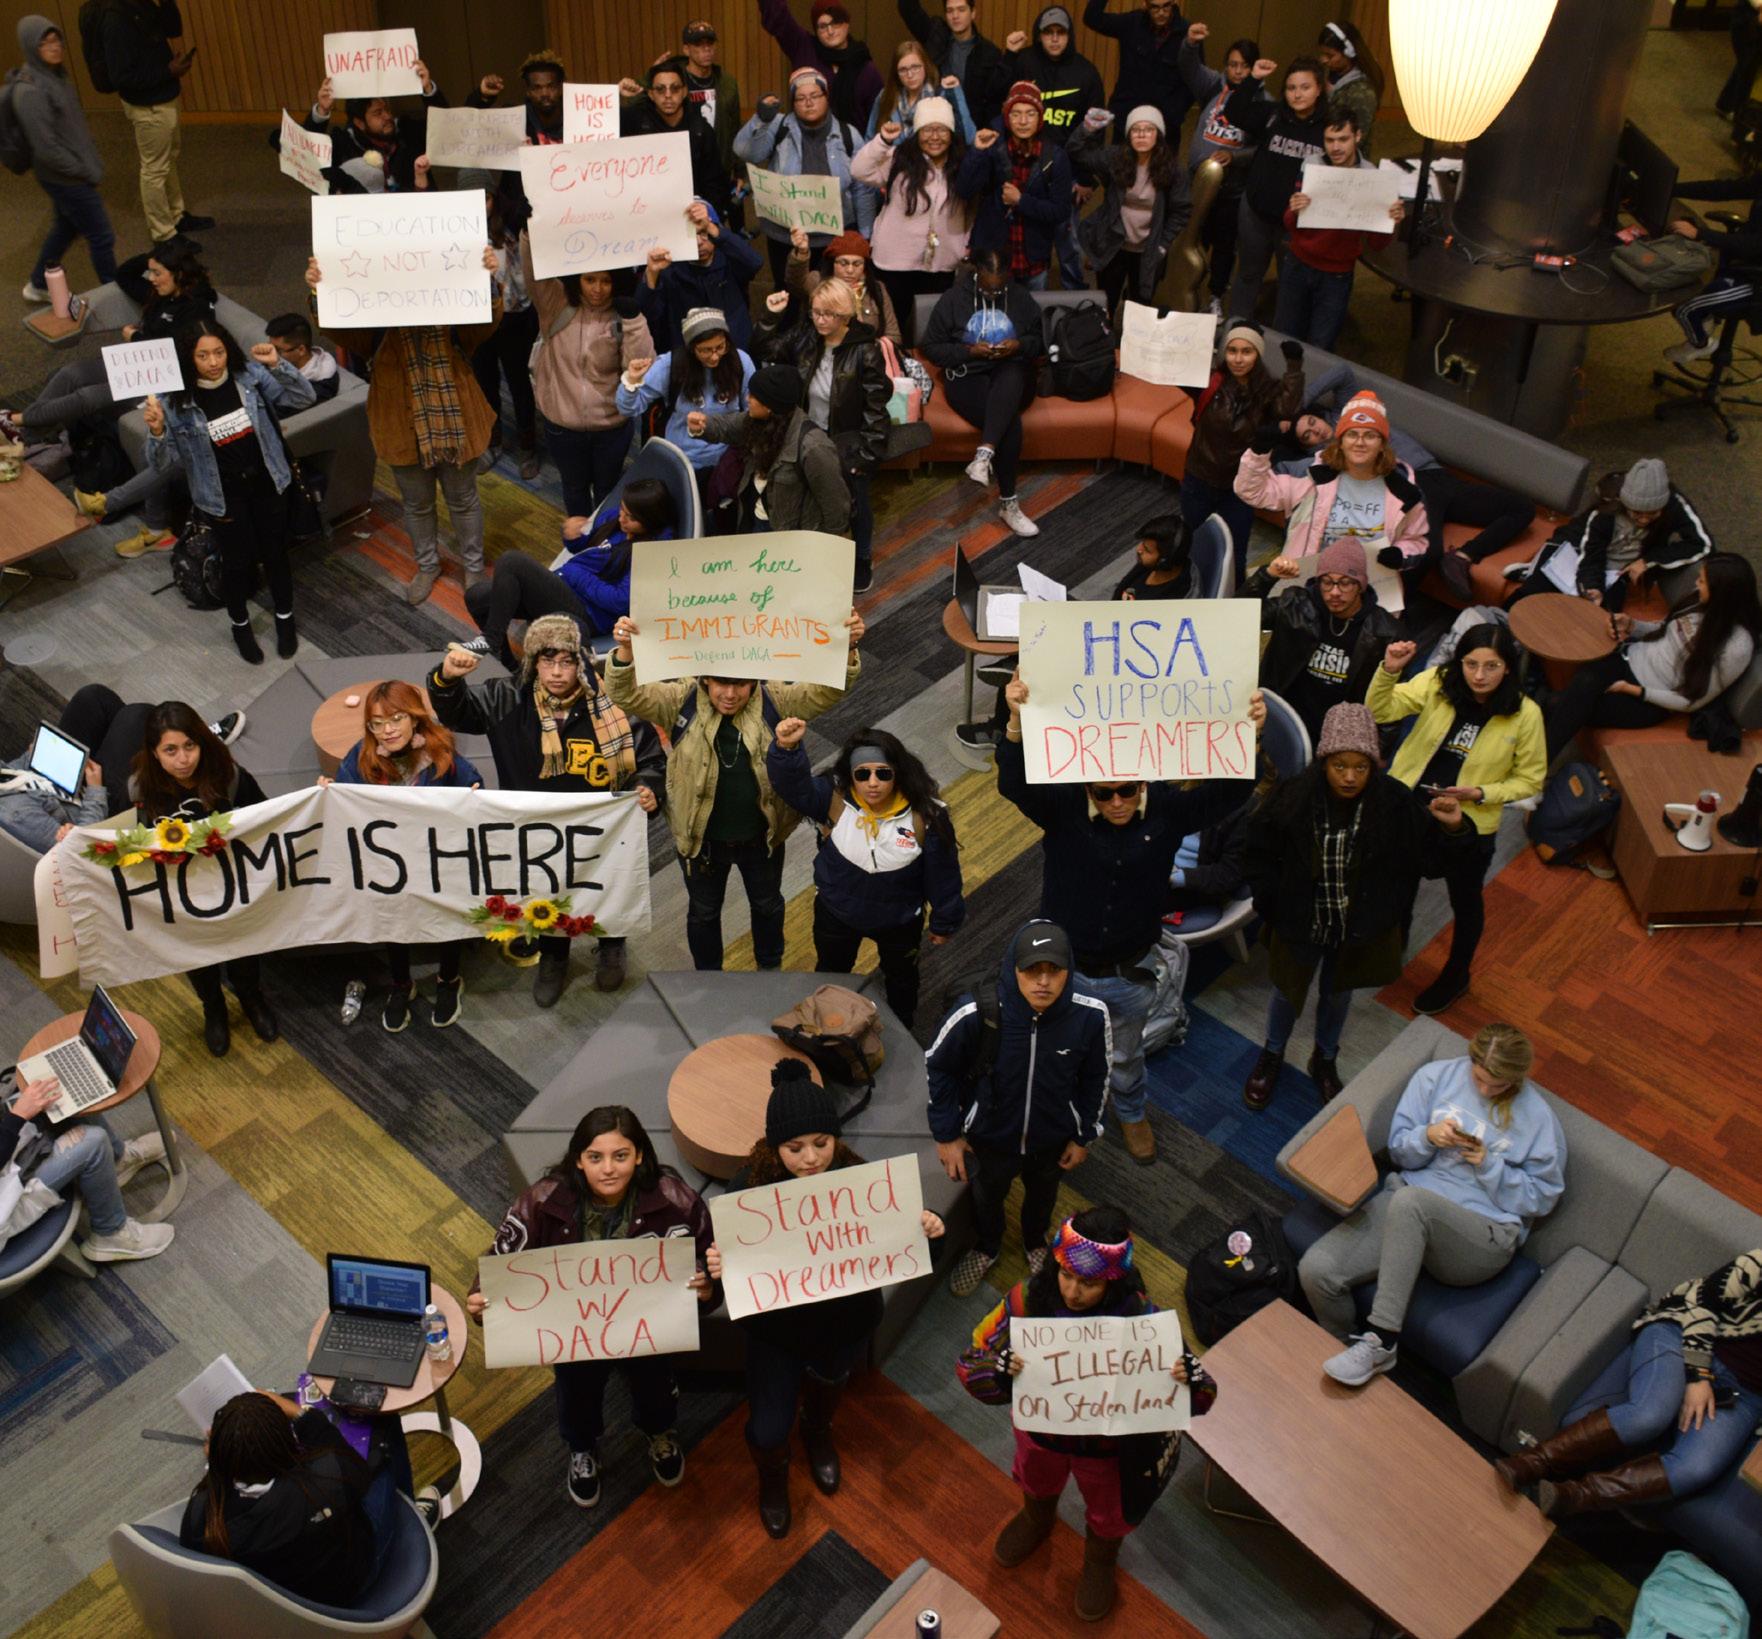 Protestors support DACA inside John Peace Library. Photo courtesy of John Dye